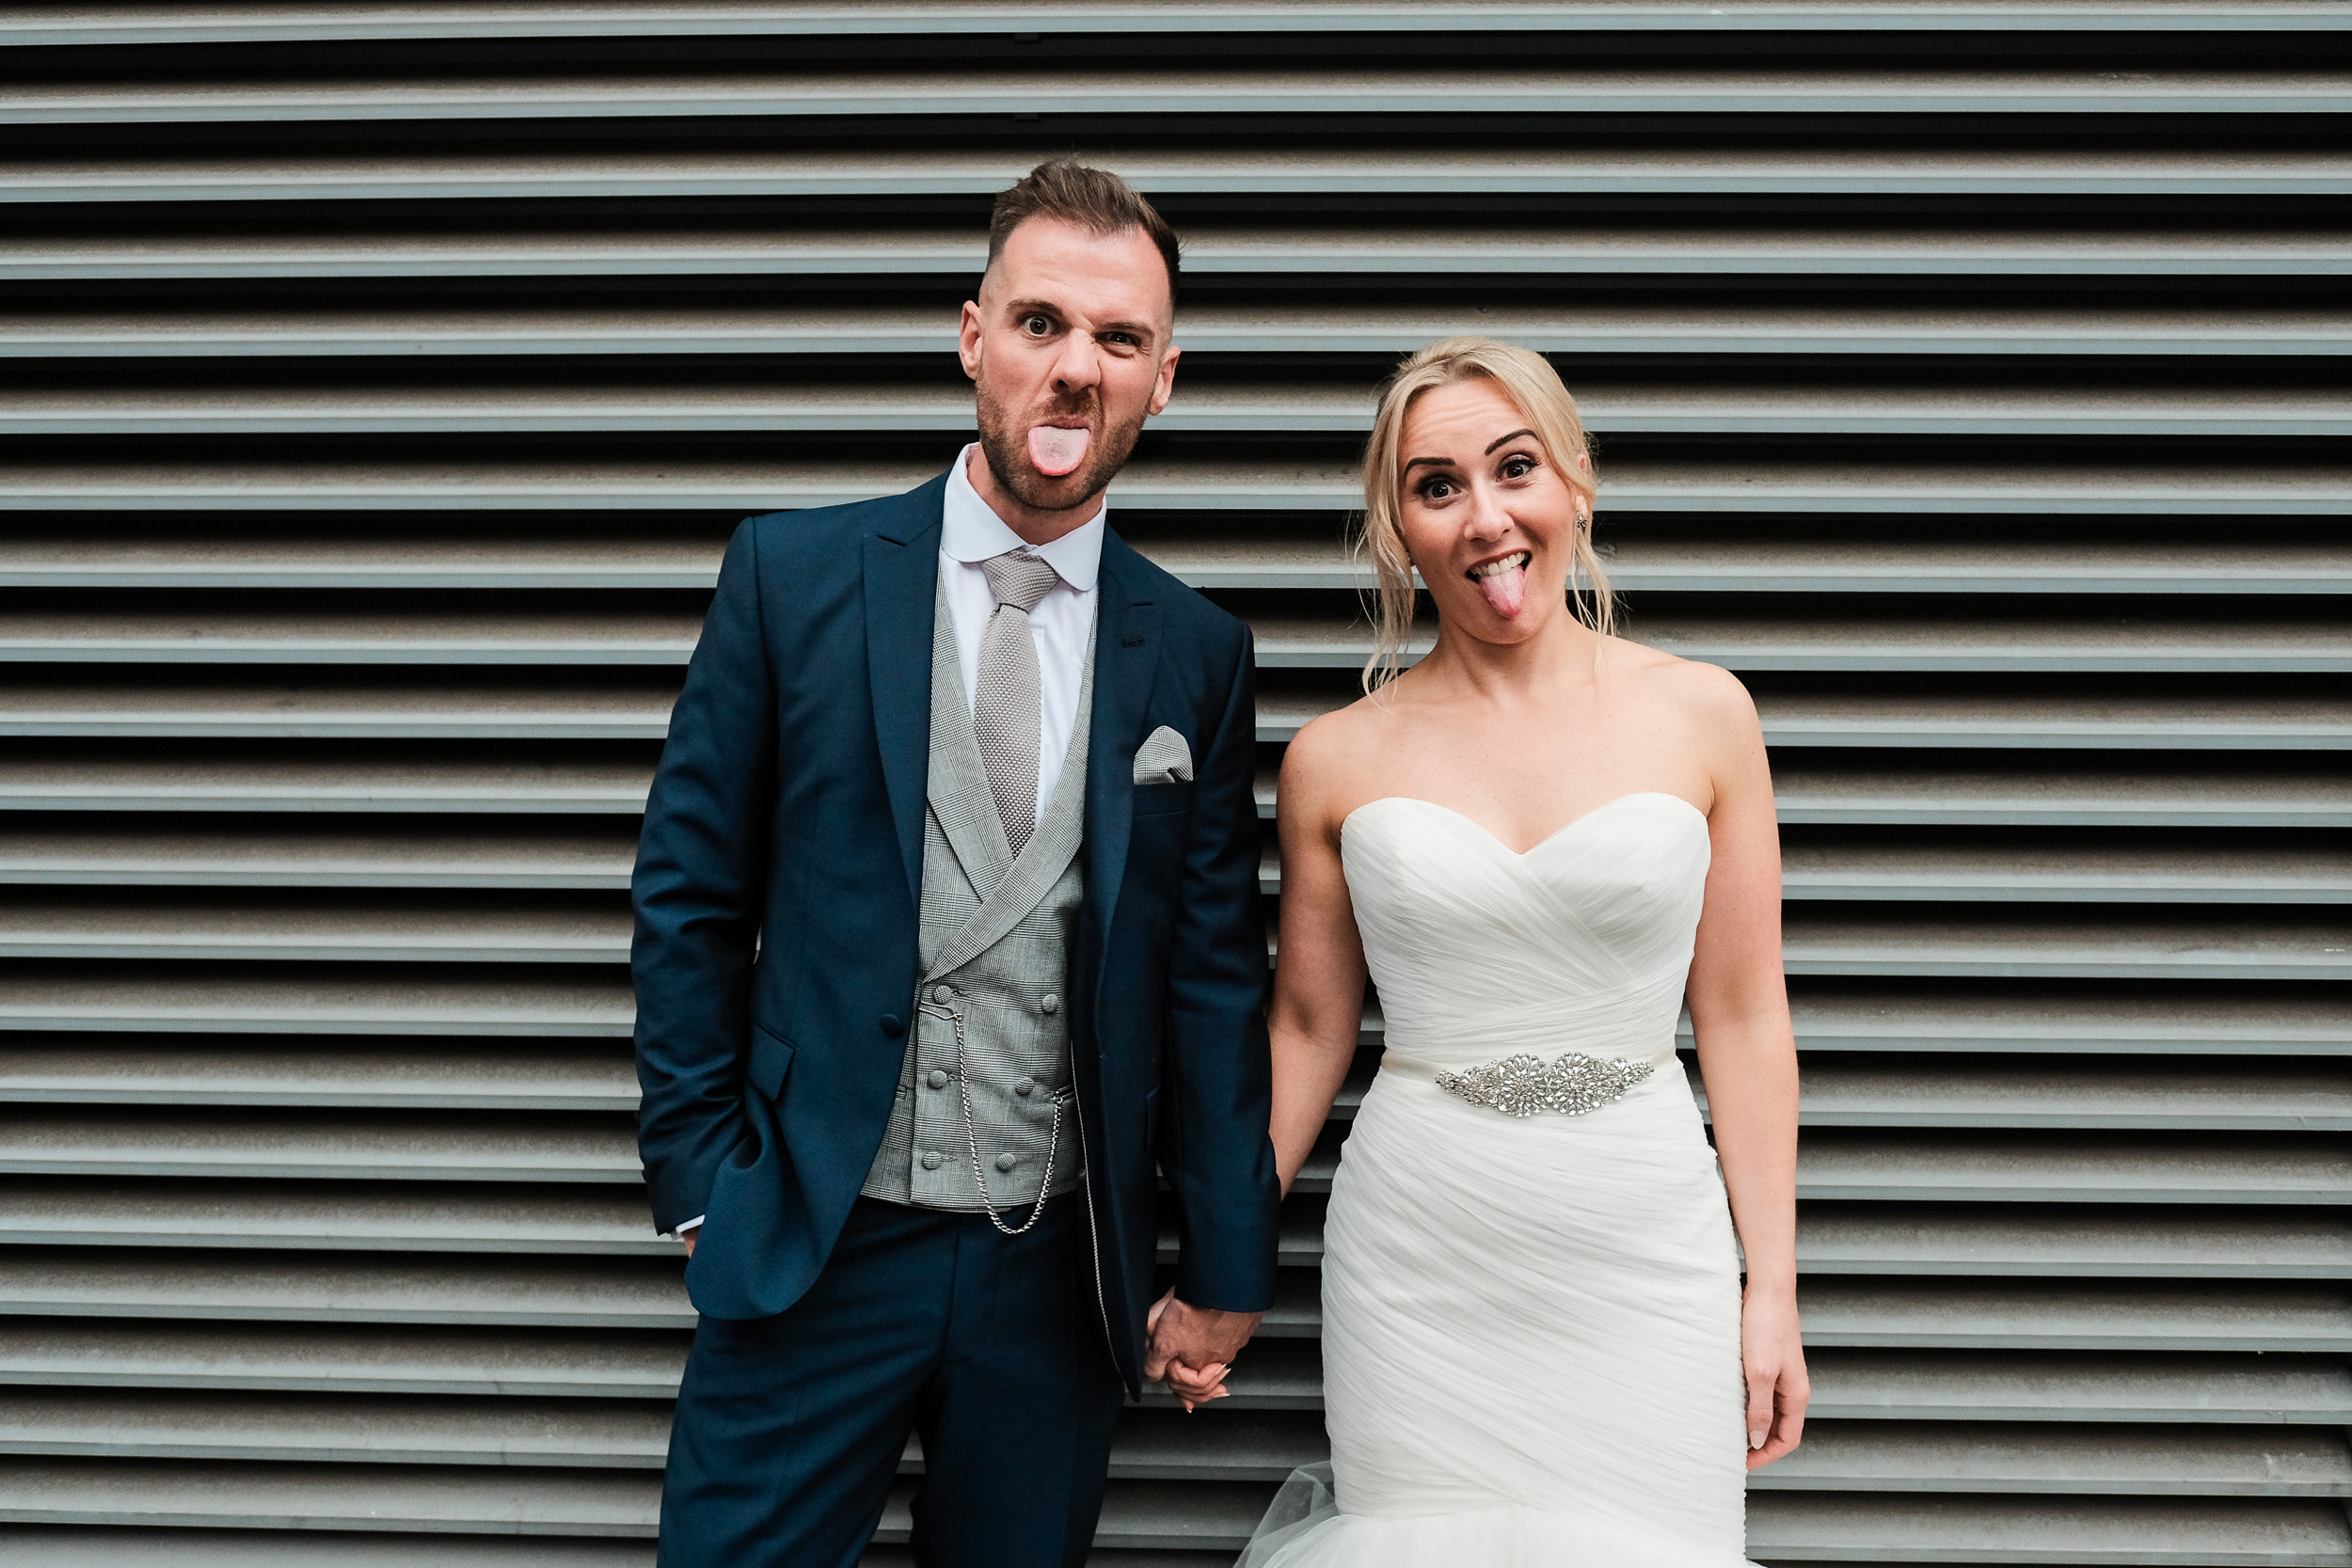 Birmingham Wedding Photographer-001-XPRO8488.jpg